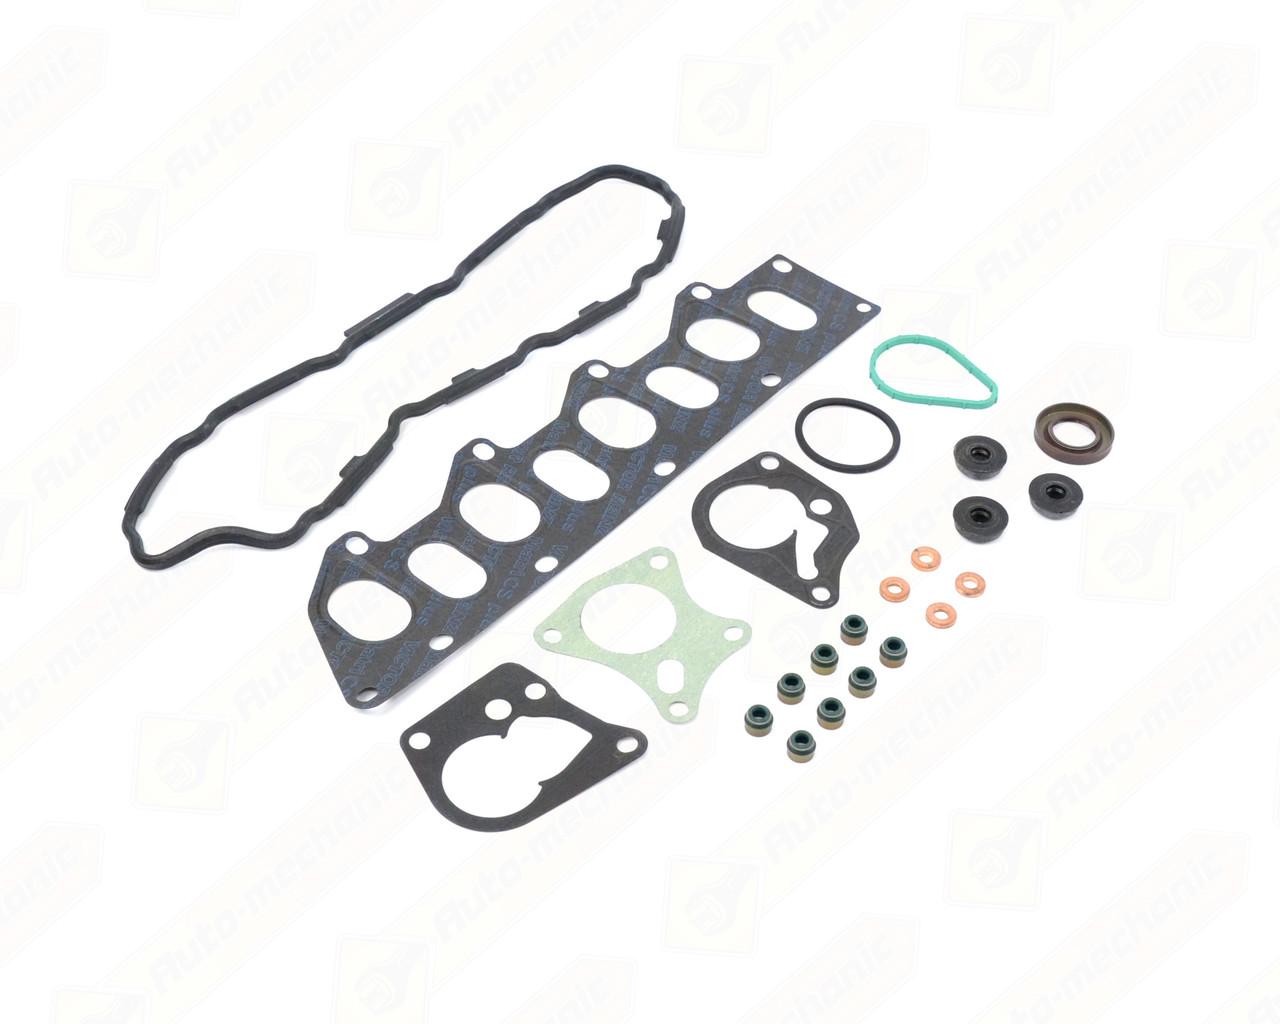 Комплект прокладок двигуна на Renault Kangoo 1997->2008 1.9 dCi - Victor Reinz (Німеччина) - 02-34409-01